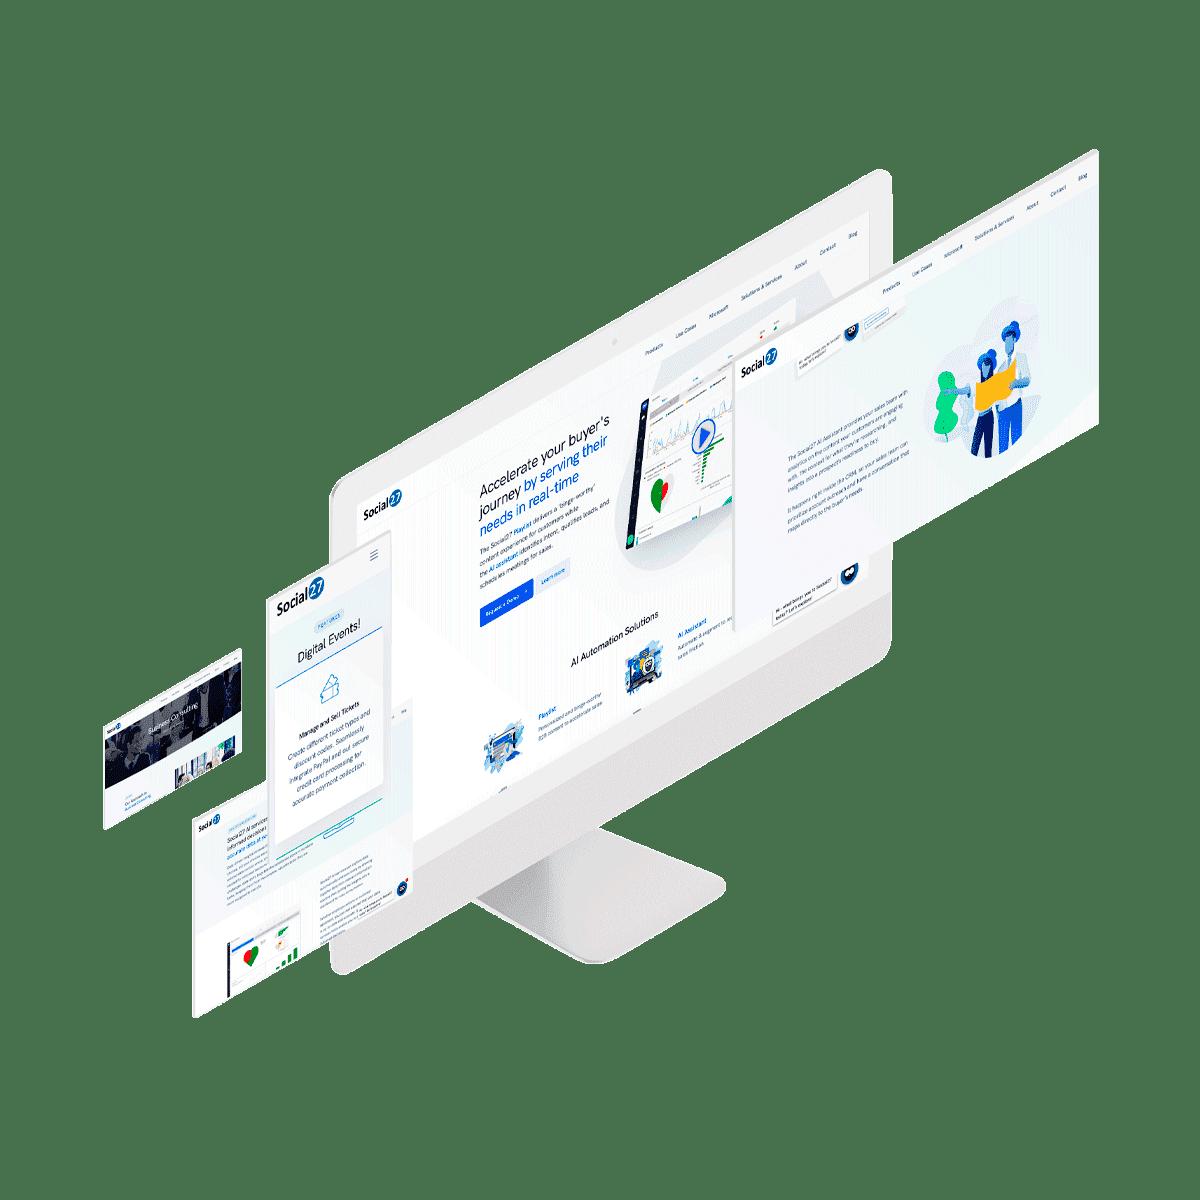 Social learning platform on monitors